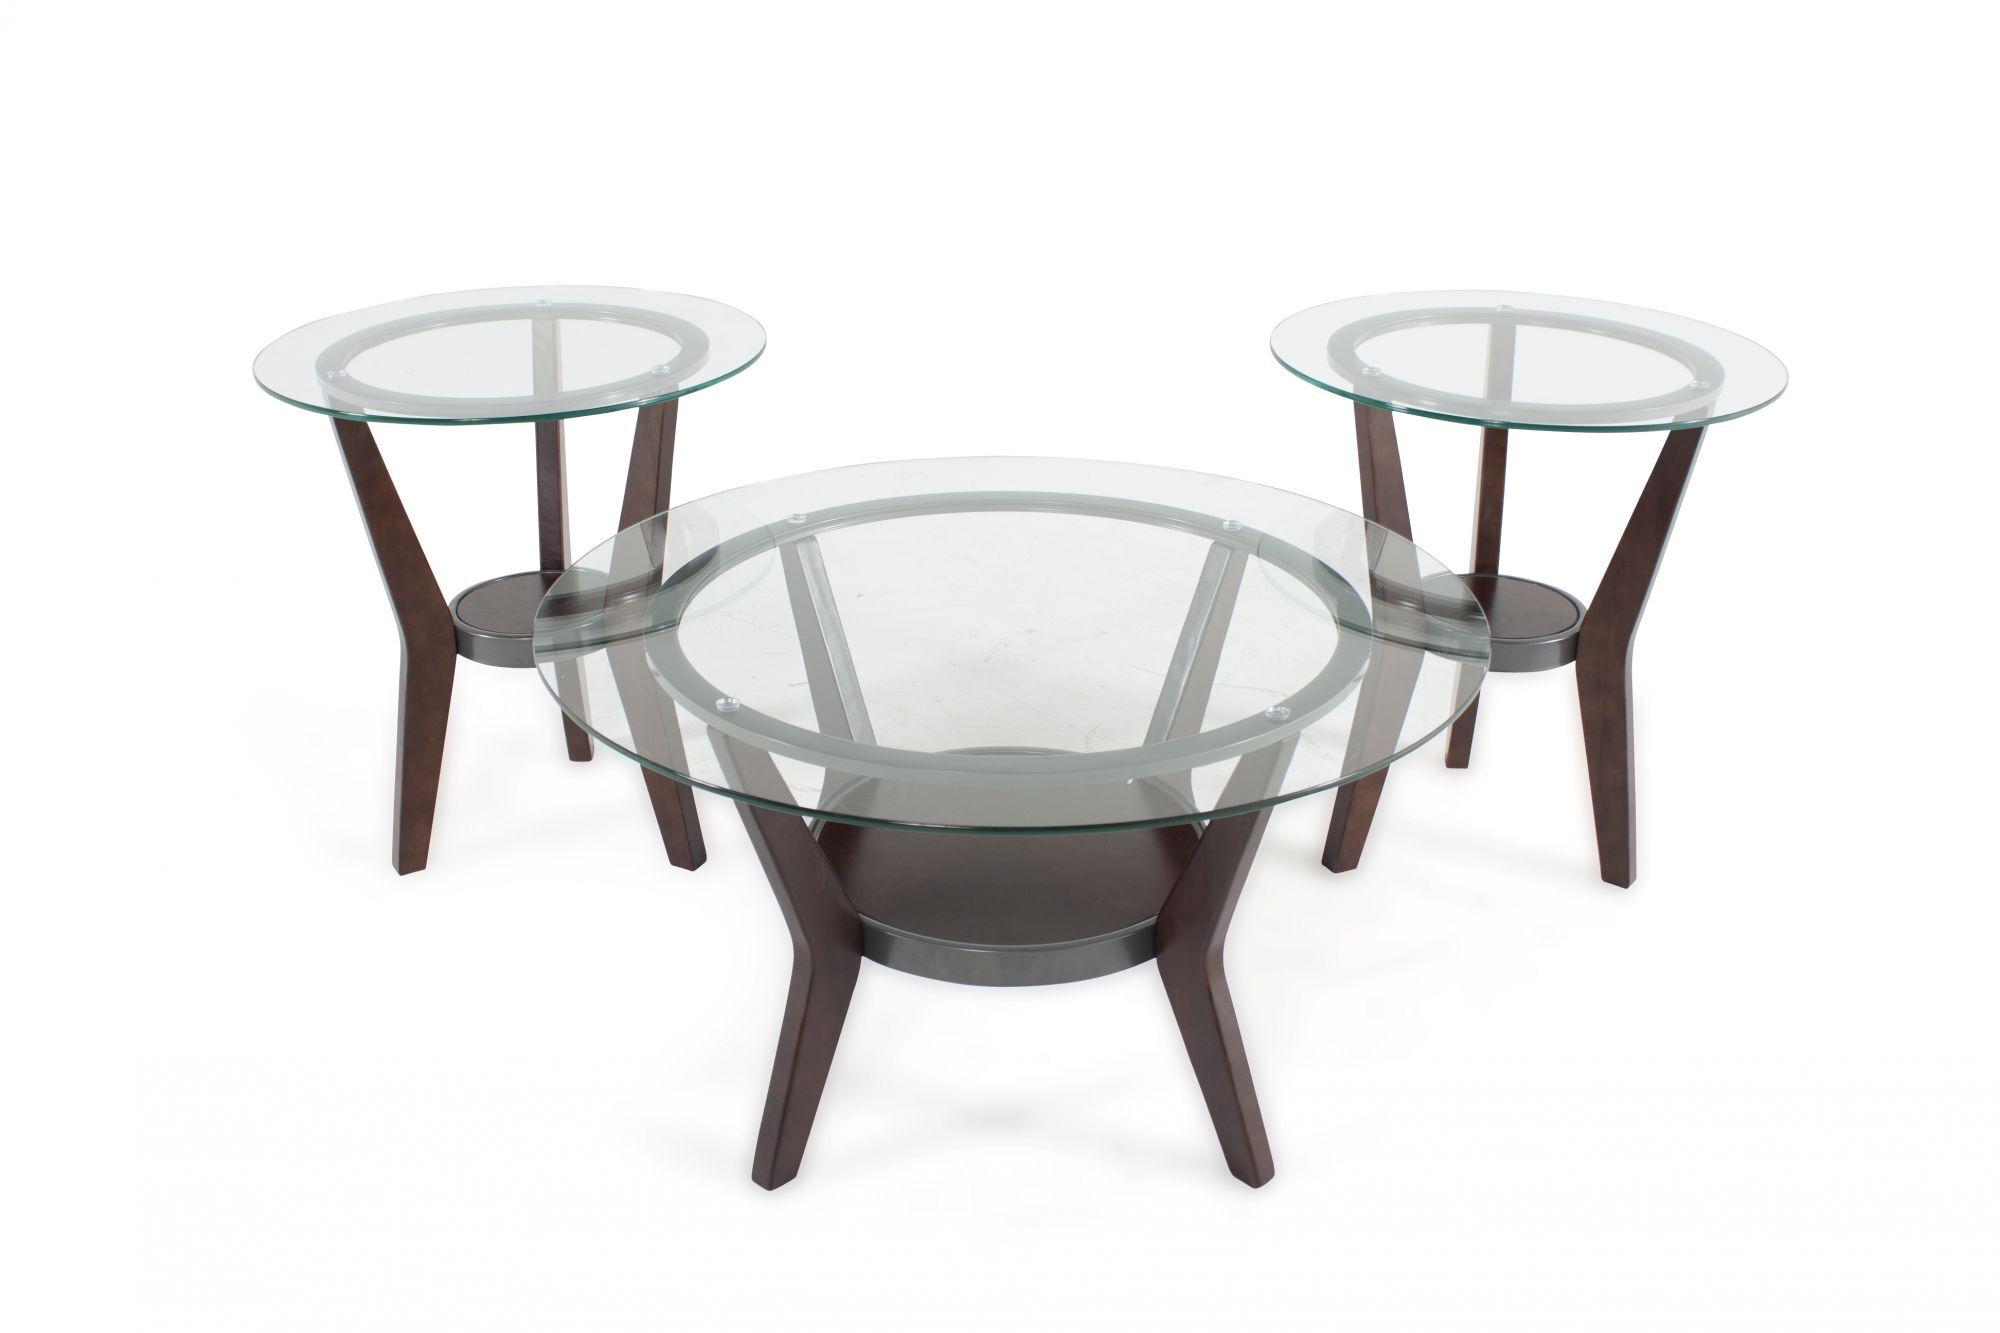 Three Piece Round Contemporary Coffee Table Set In Dark